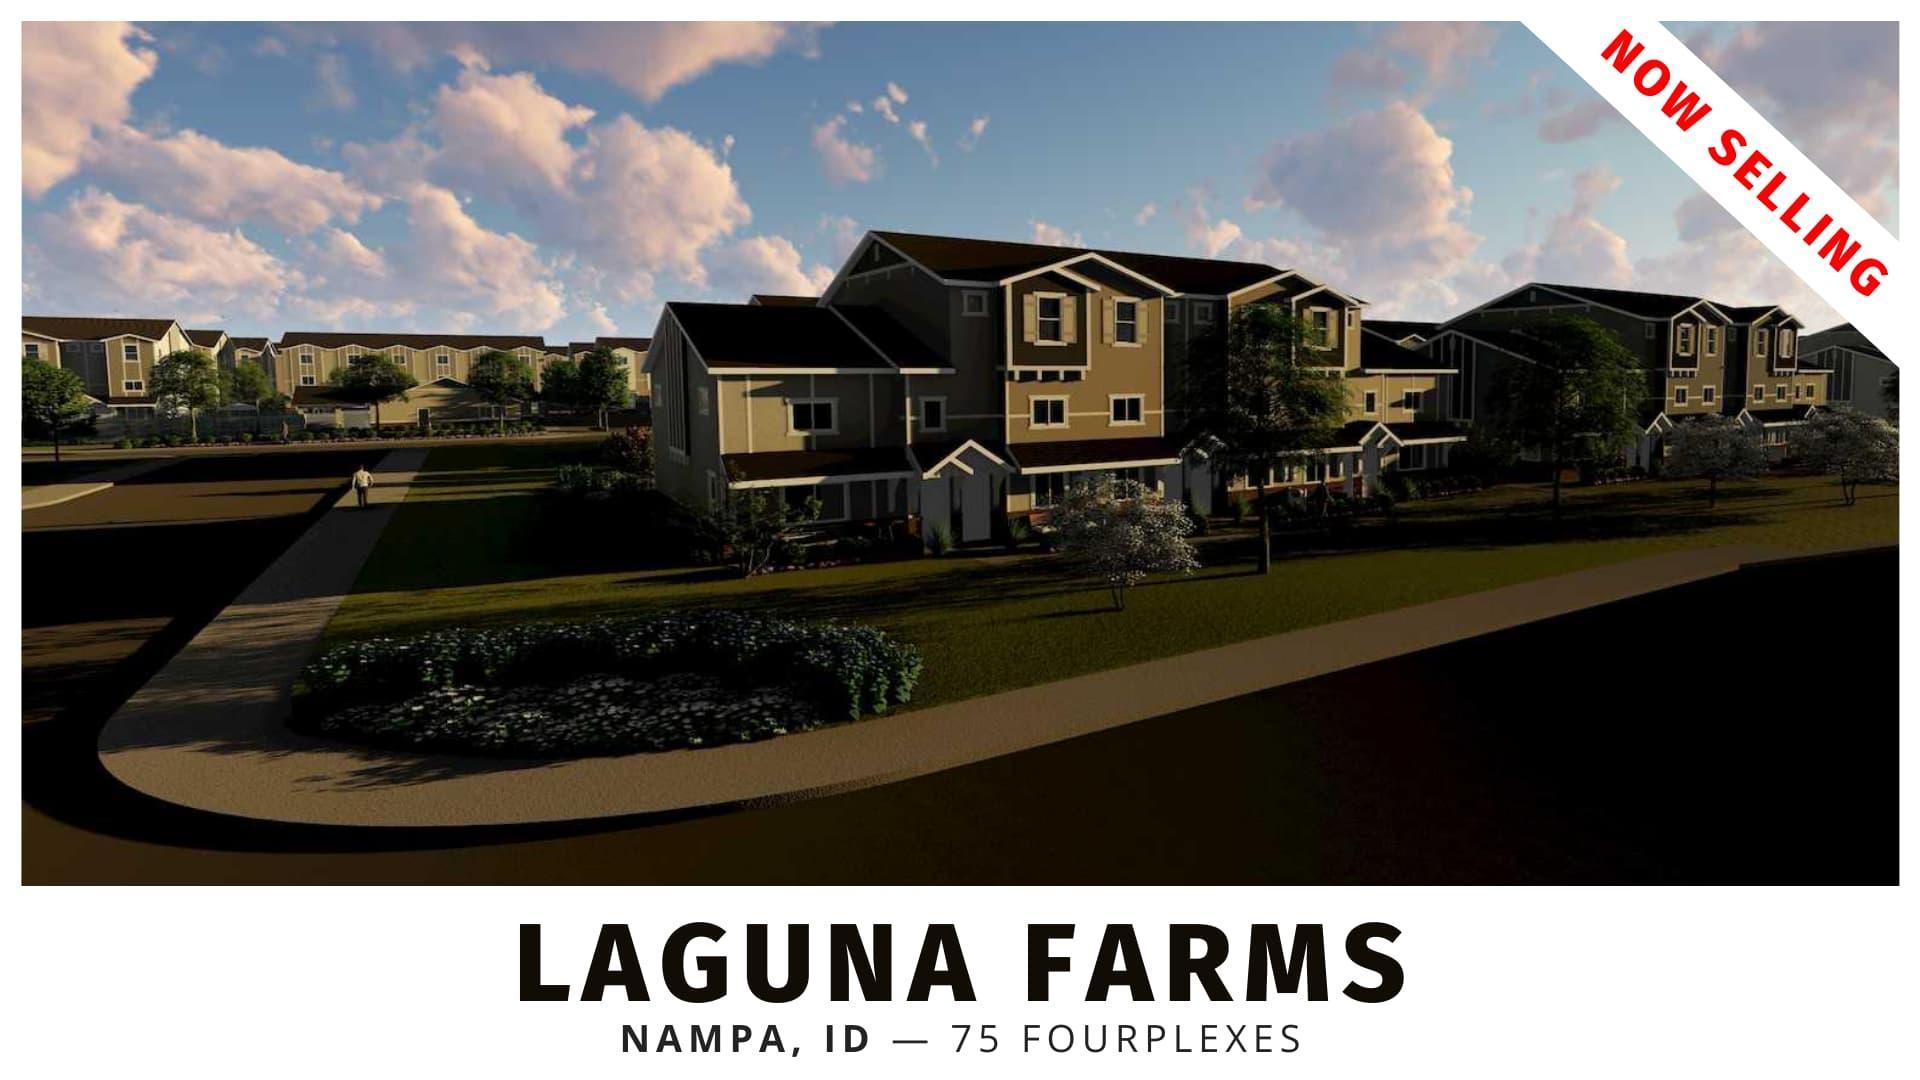 Laguna Farms Fourplexes for Sale in Nampa, Idaho